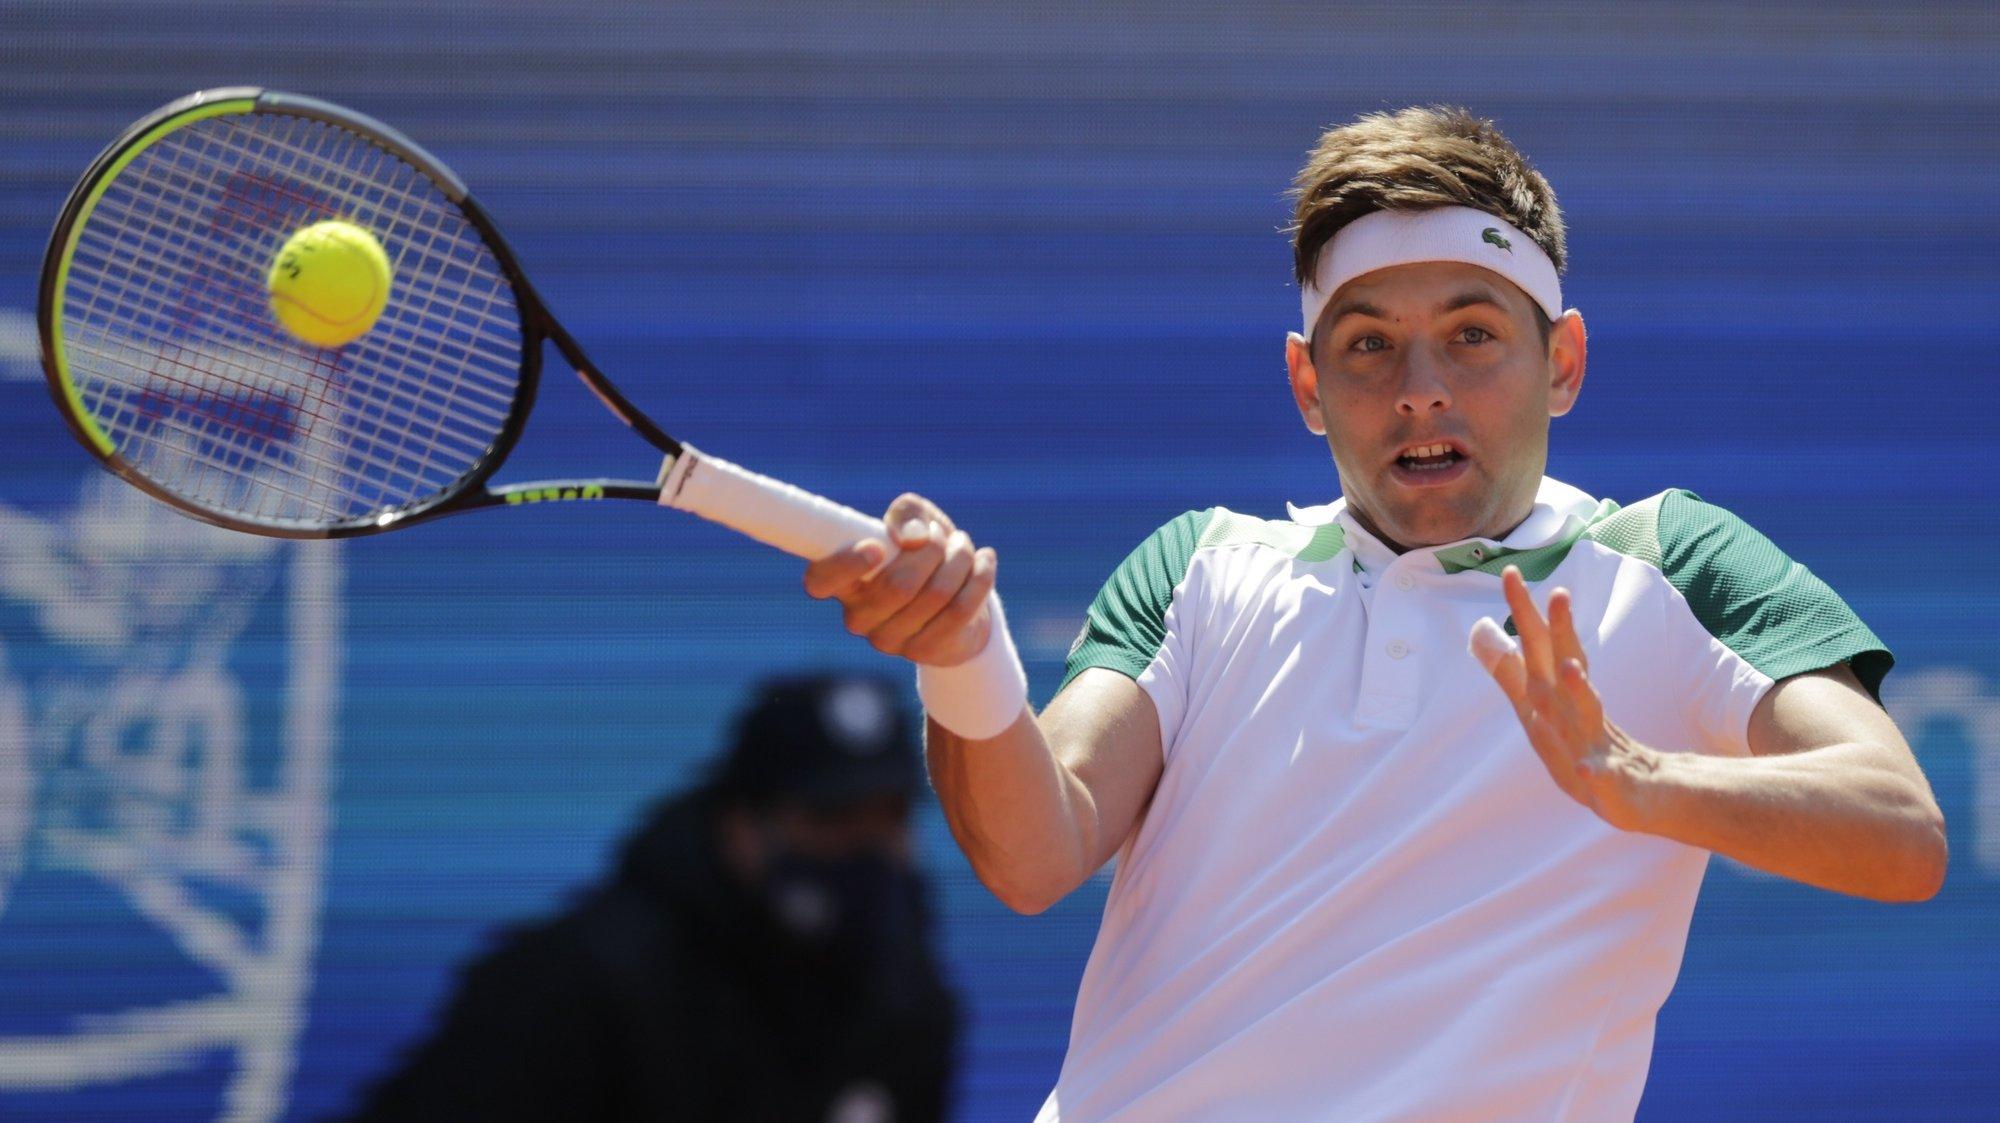 epa09154773 Filip Krajinovic of Serbia in action against Matteo Berrettini of Italy during their quarter final match of the Serbia Open tennis tournament in Belgrade, Serbia, 23 April 2021.  EPA/ANDREJ CUKIC